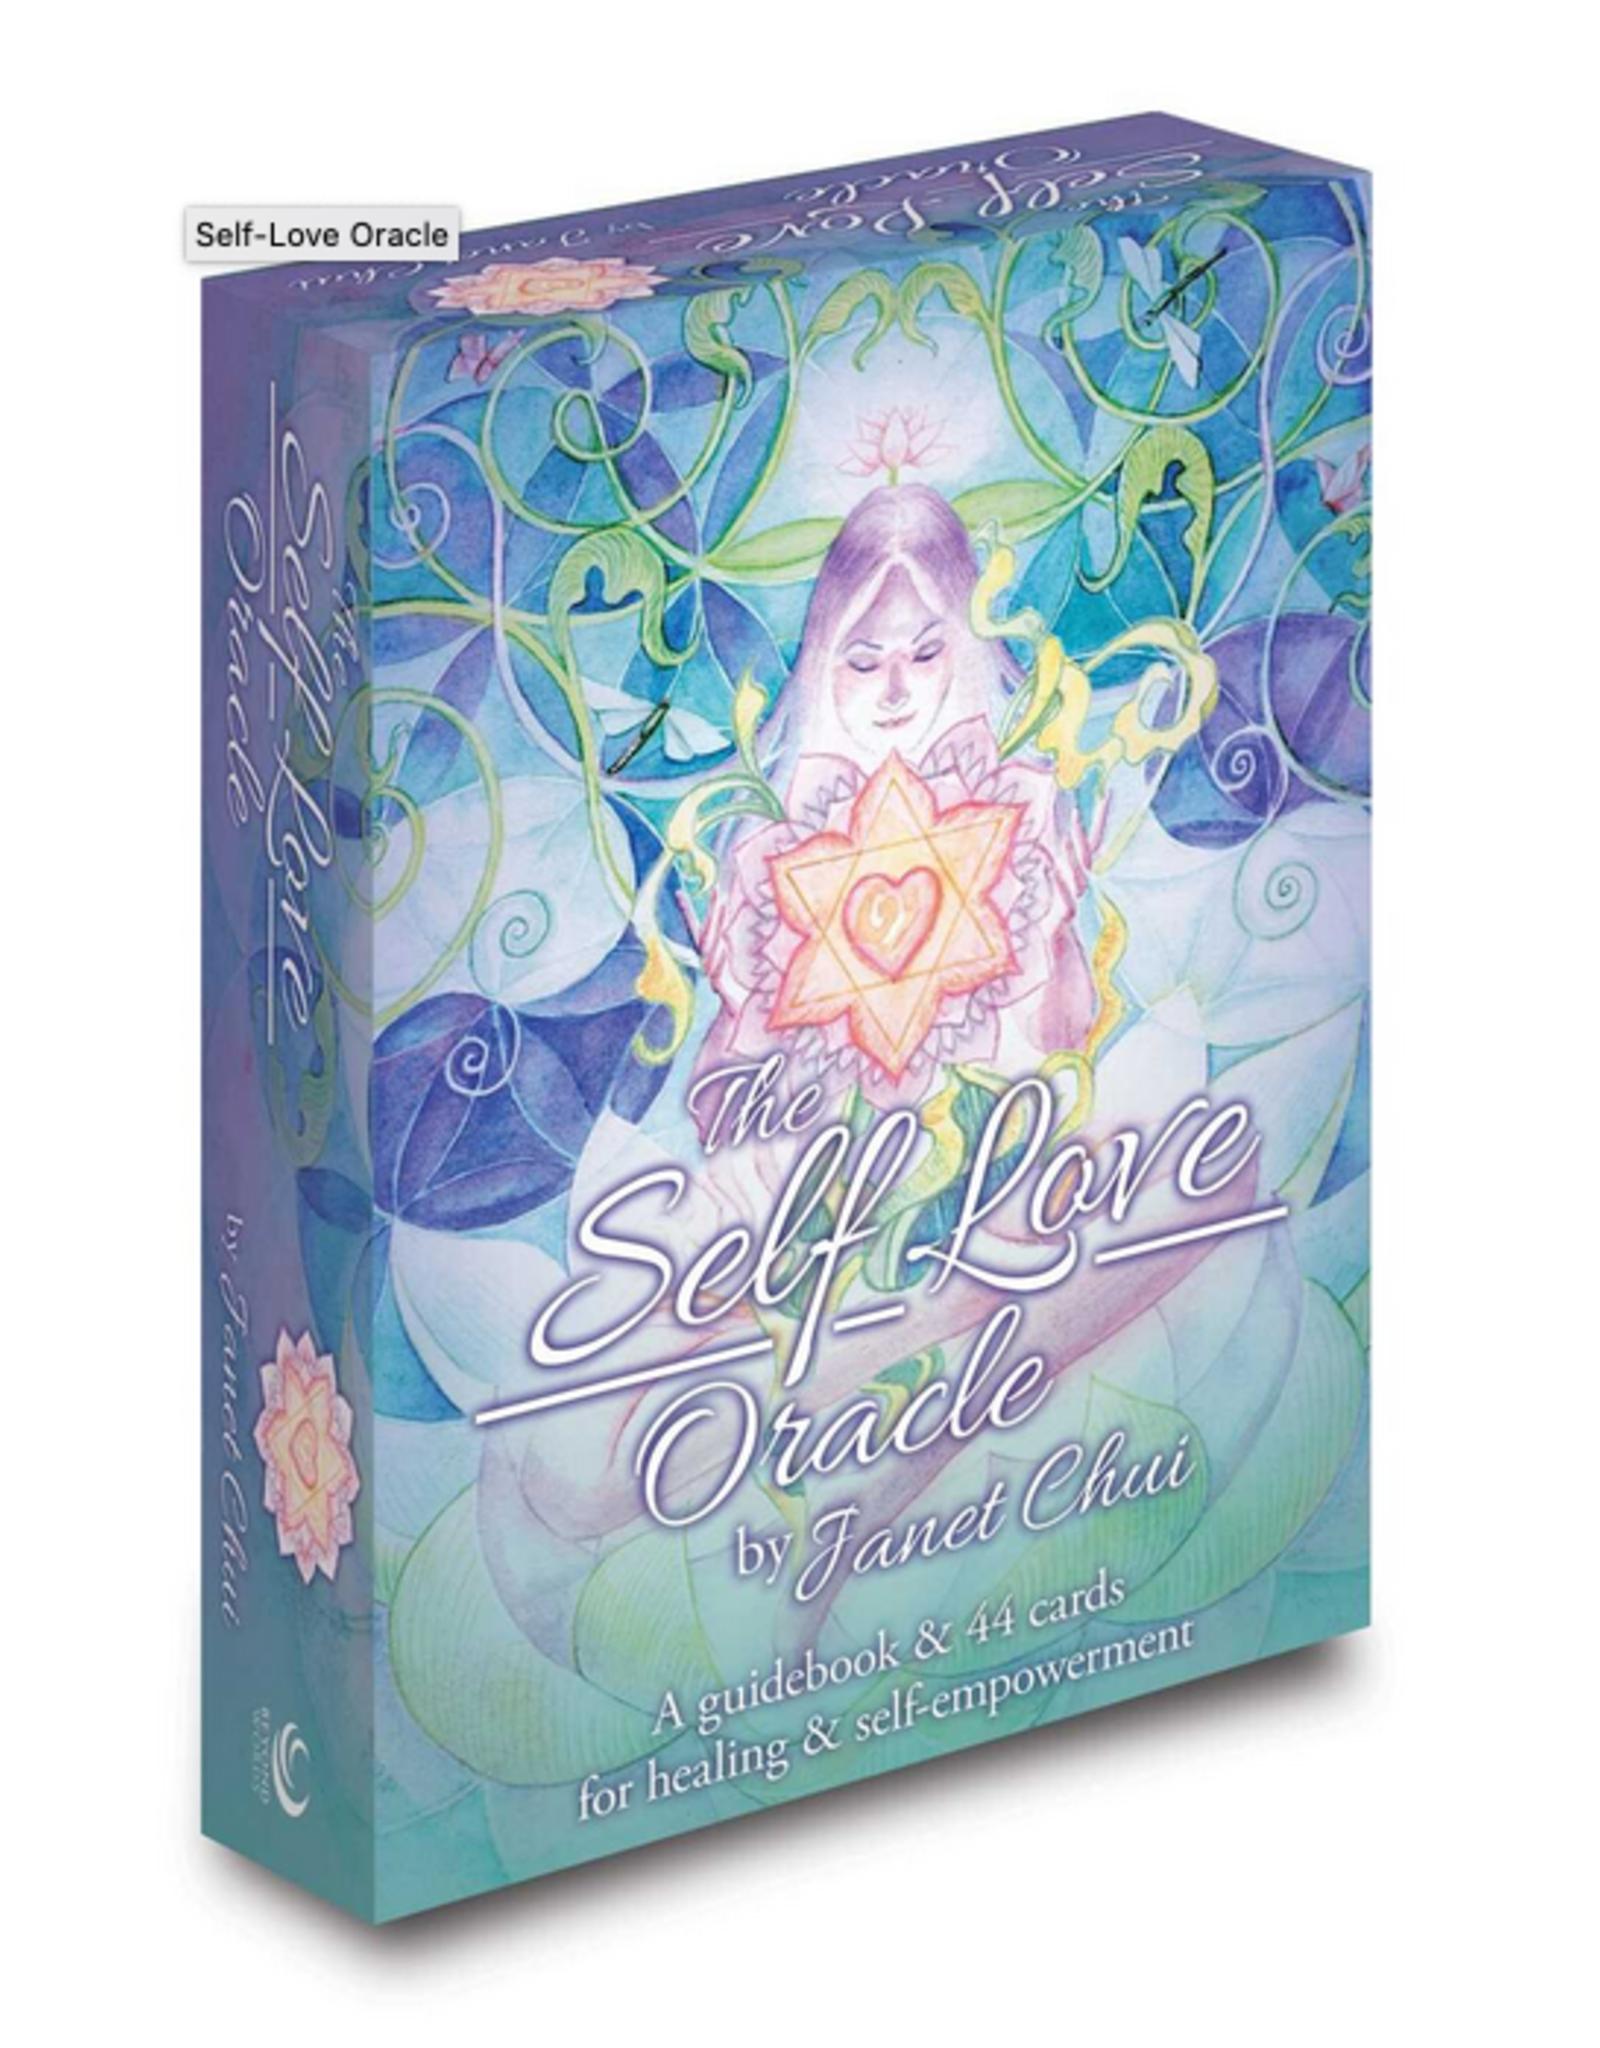 Simon & Schuster The Self-Love Oracle